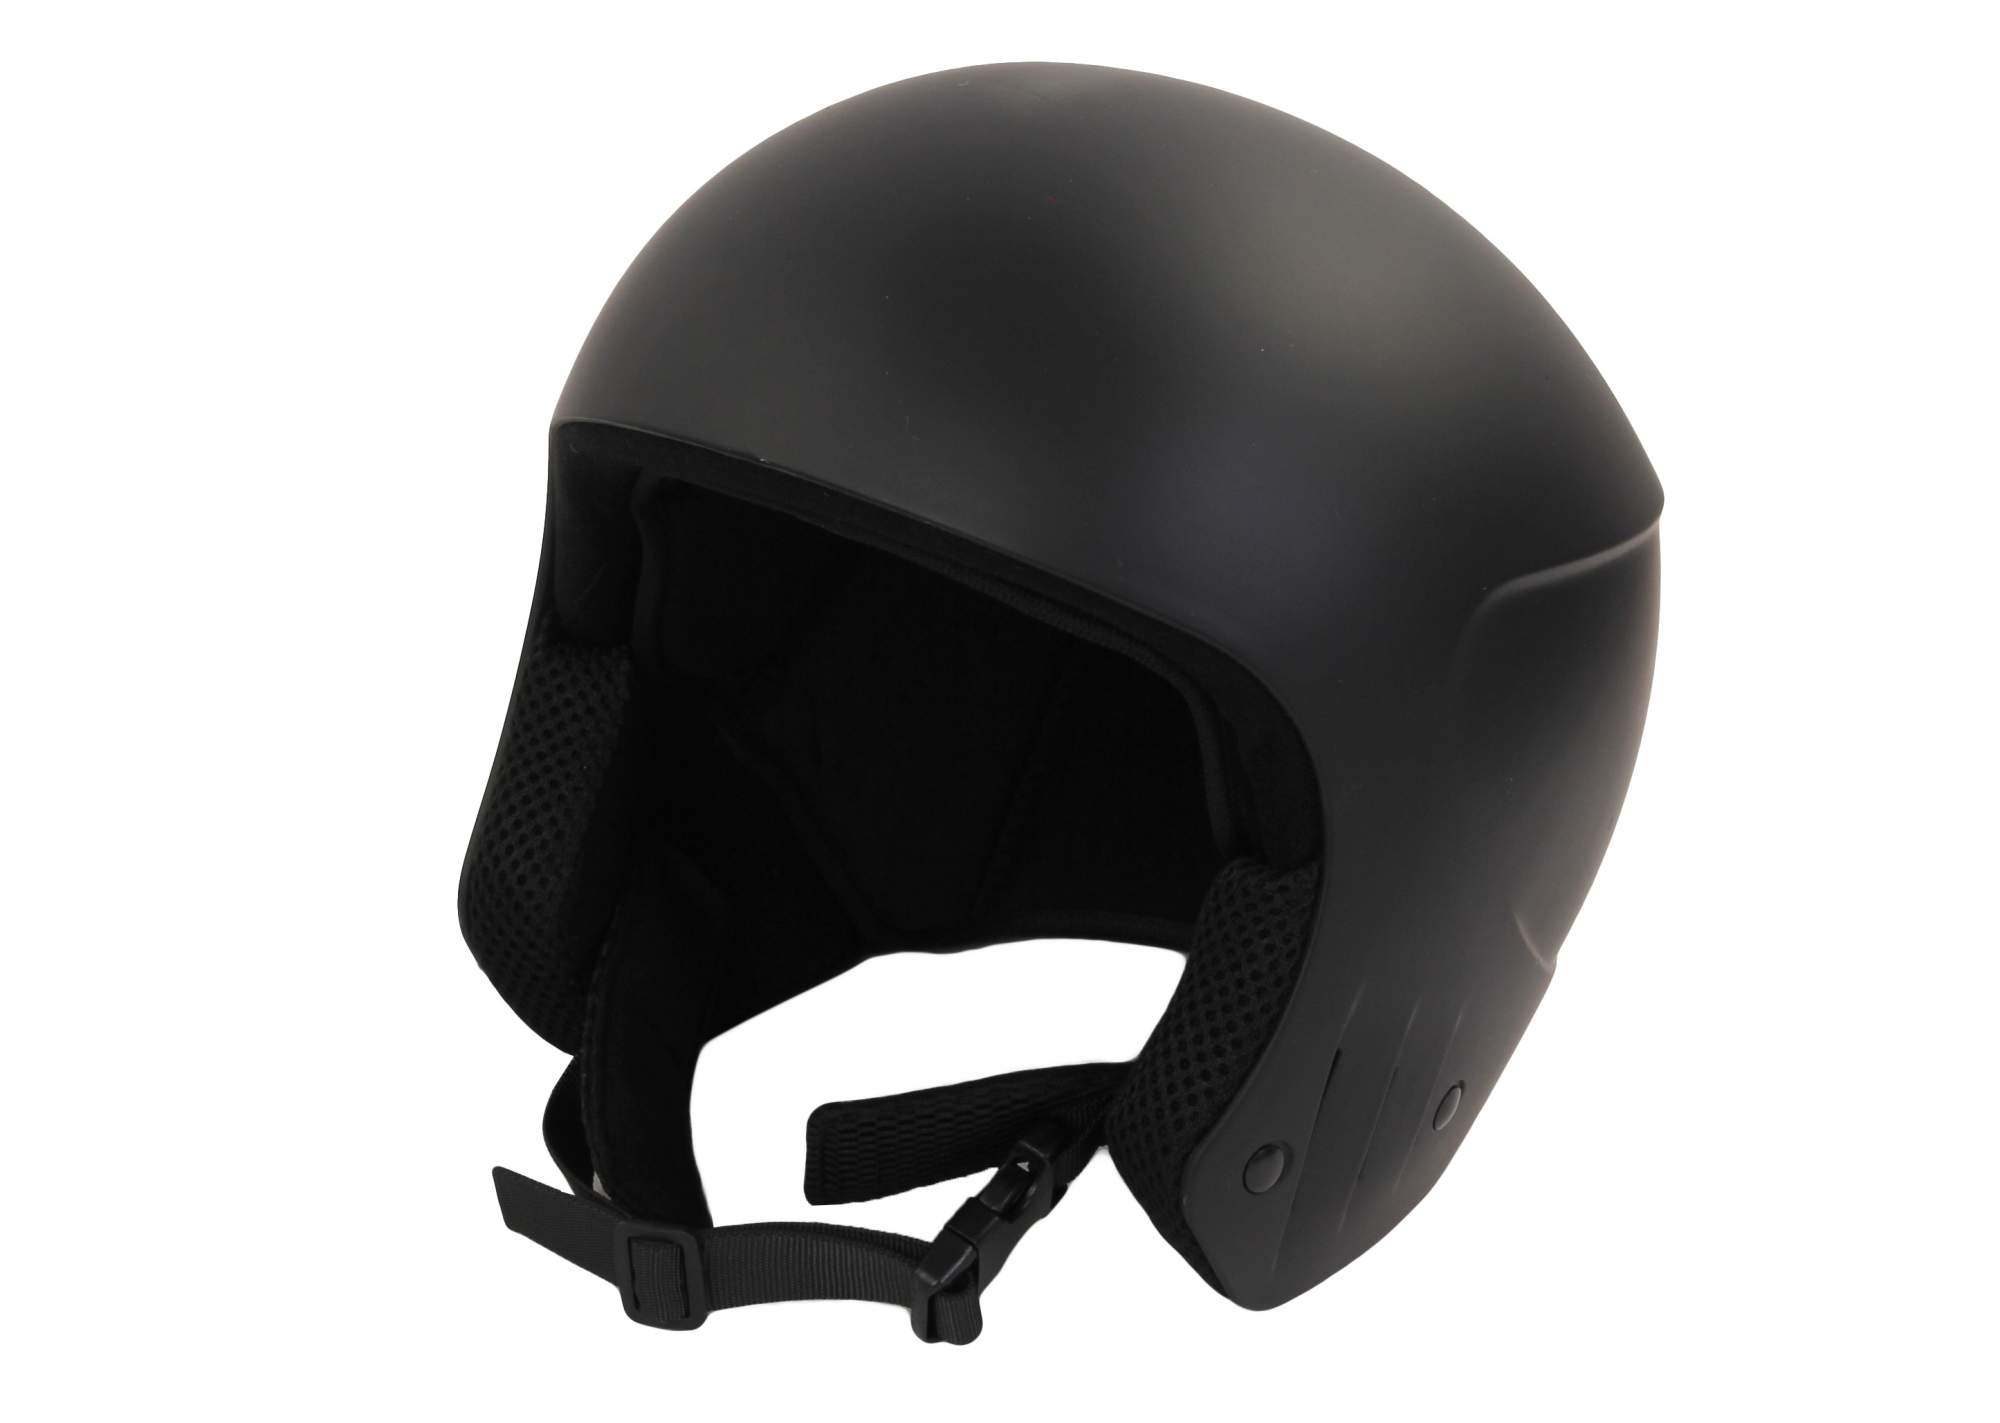 Горнолыжный шлем Sky Monkey V-013B 2019, черный, S